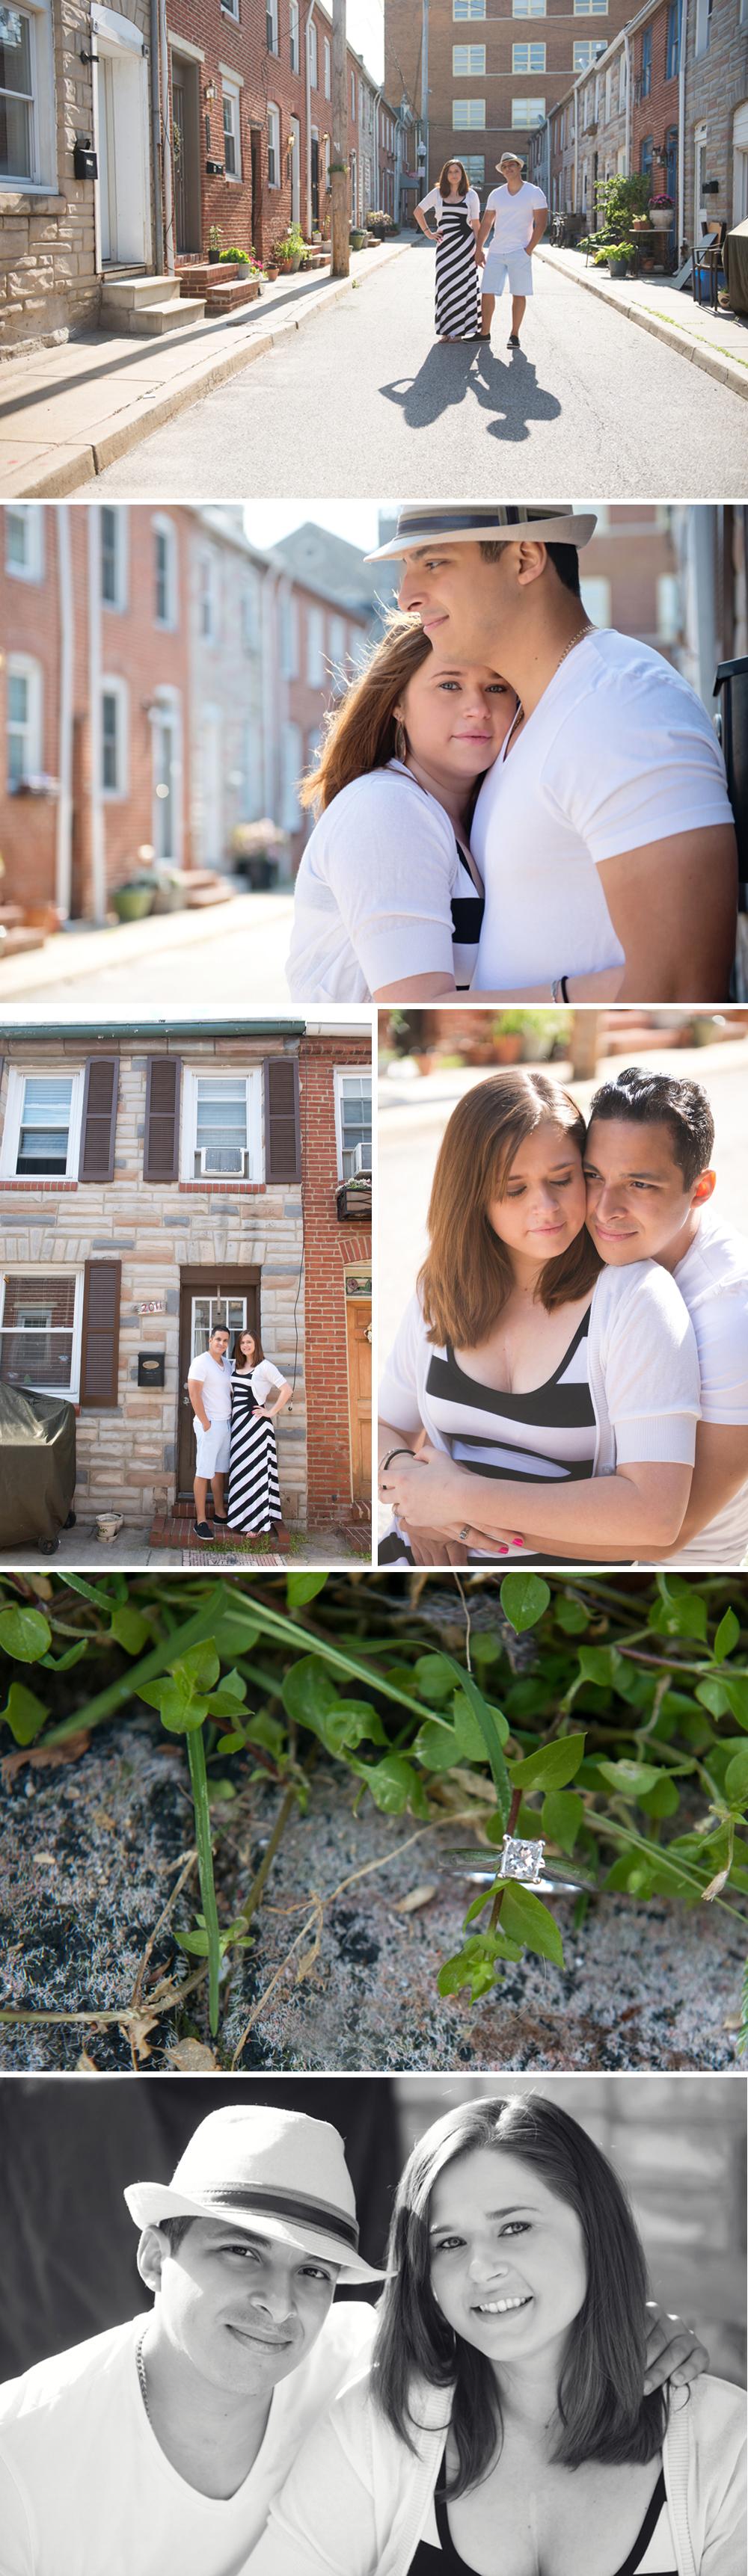 Baltimore_Engagement-07